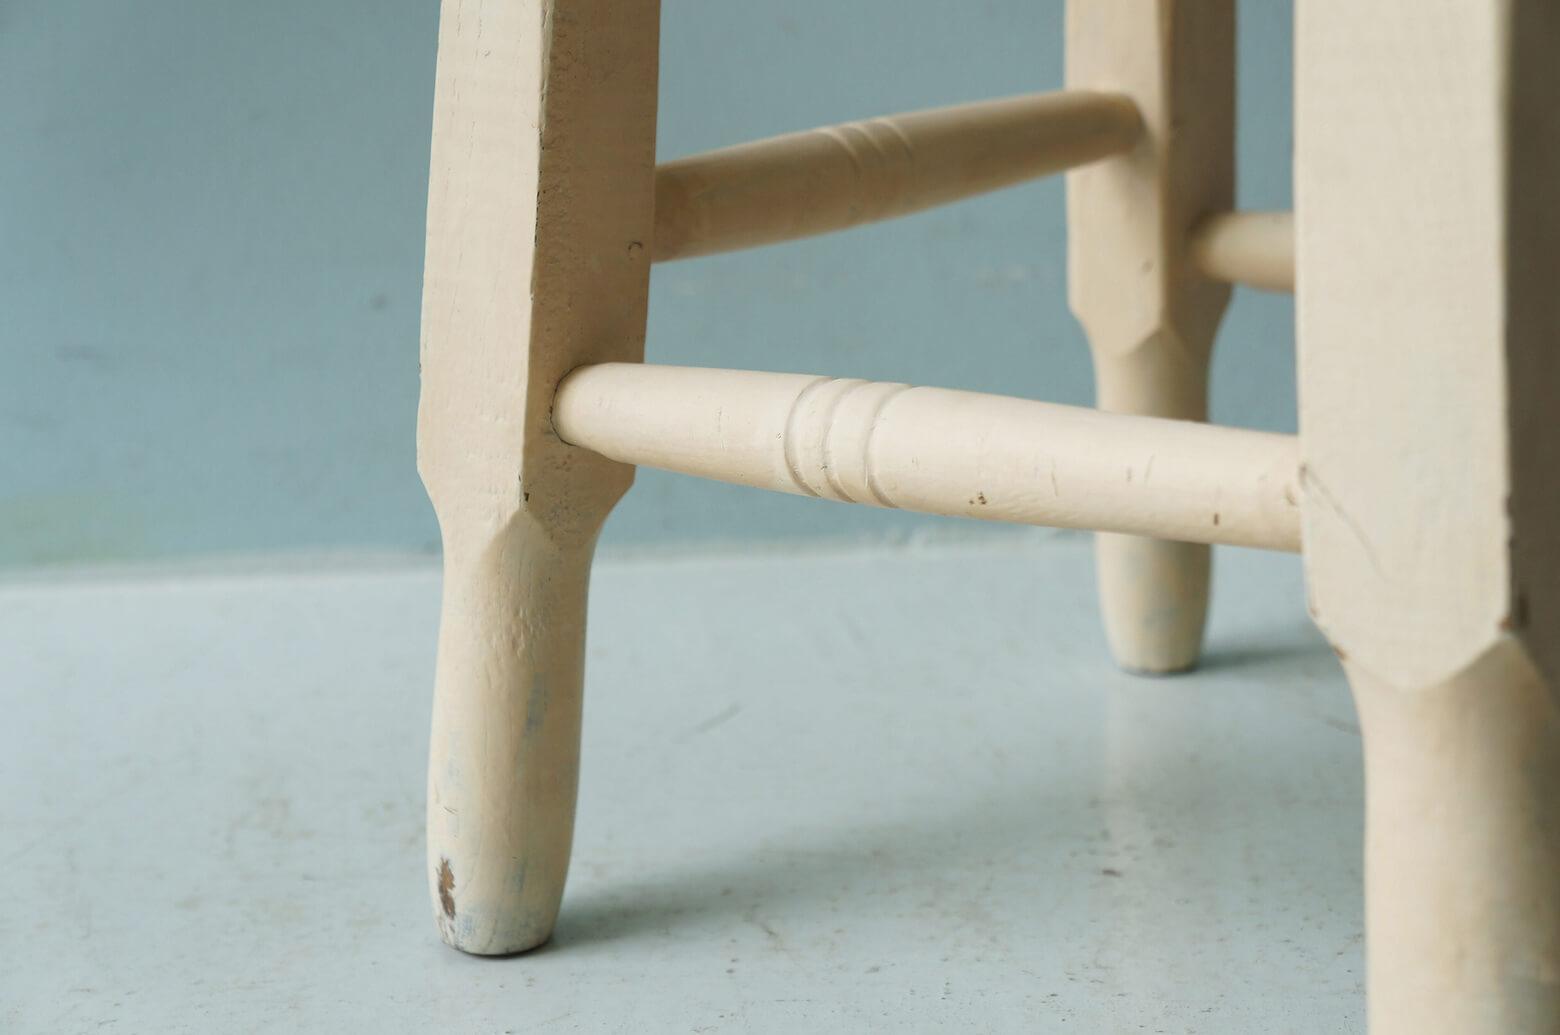 Vintage Round Stool Painted White/ヴィンテージ スツール ホワイトペイント シャビーシック アンティーク 丸椅子